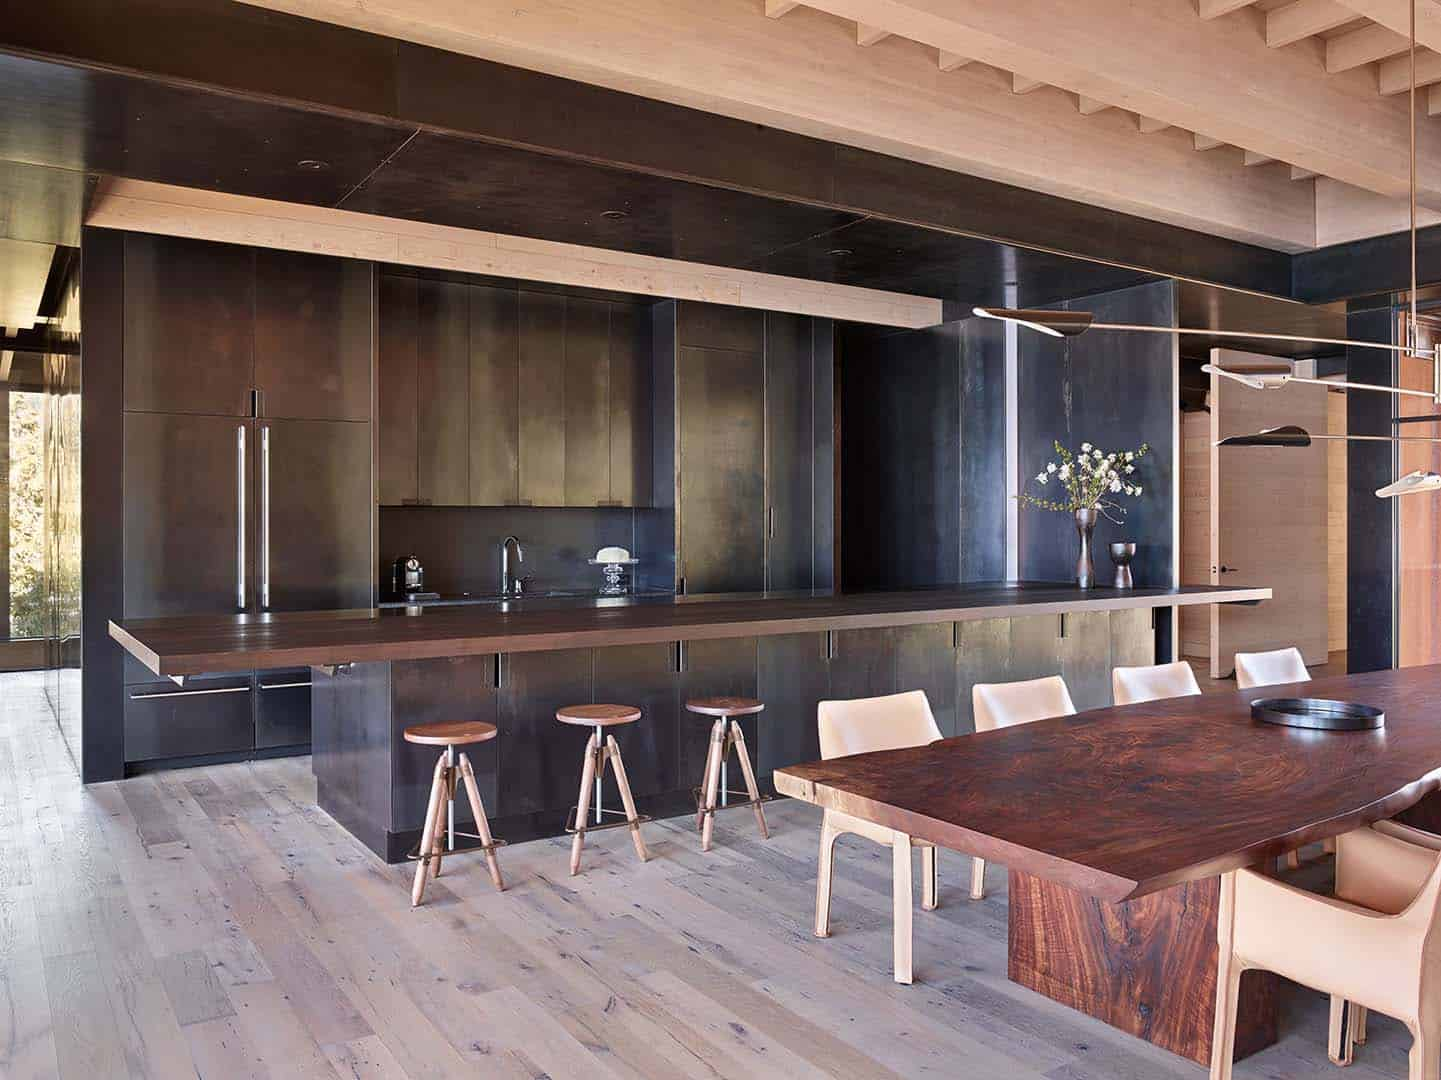 Mountain Ski Retreat-Olson Kundig Architects-28-1 Kindesign